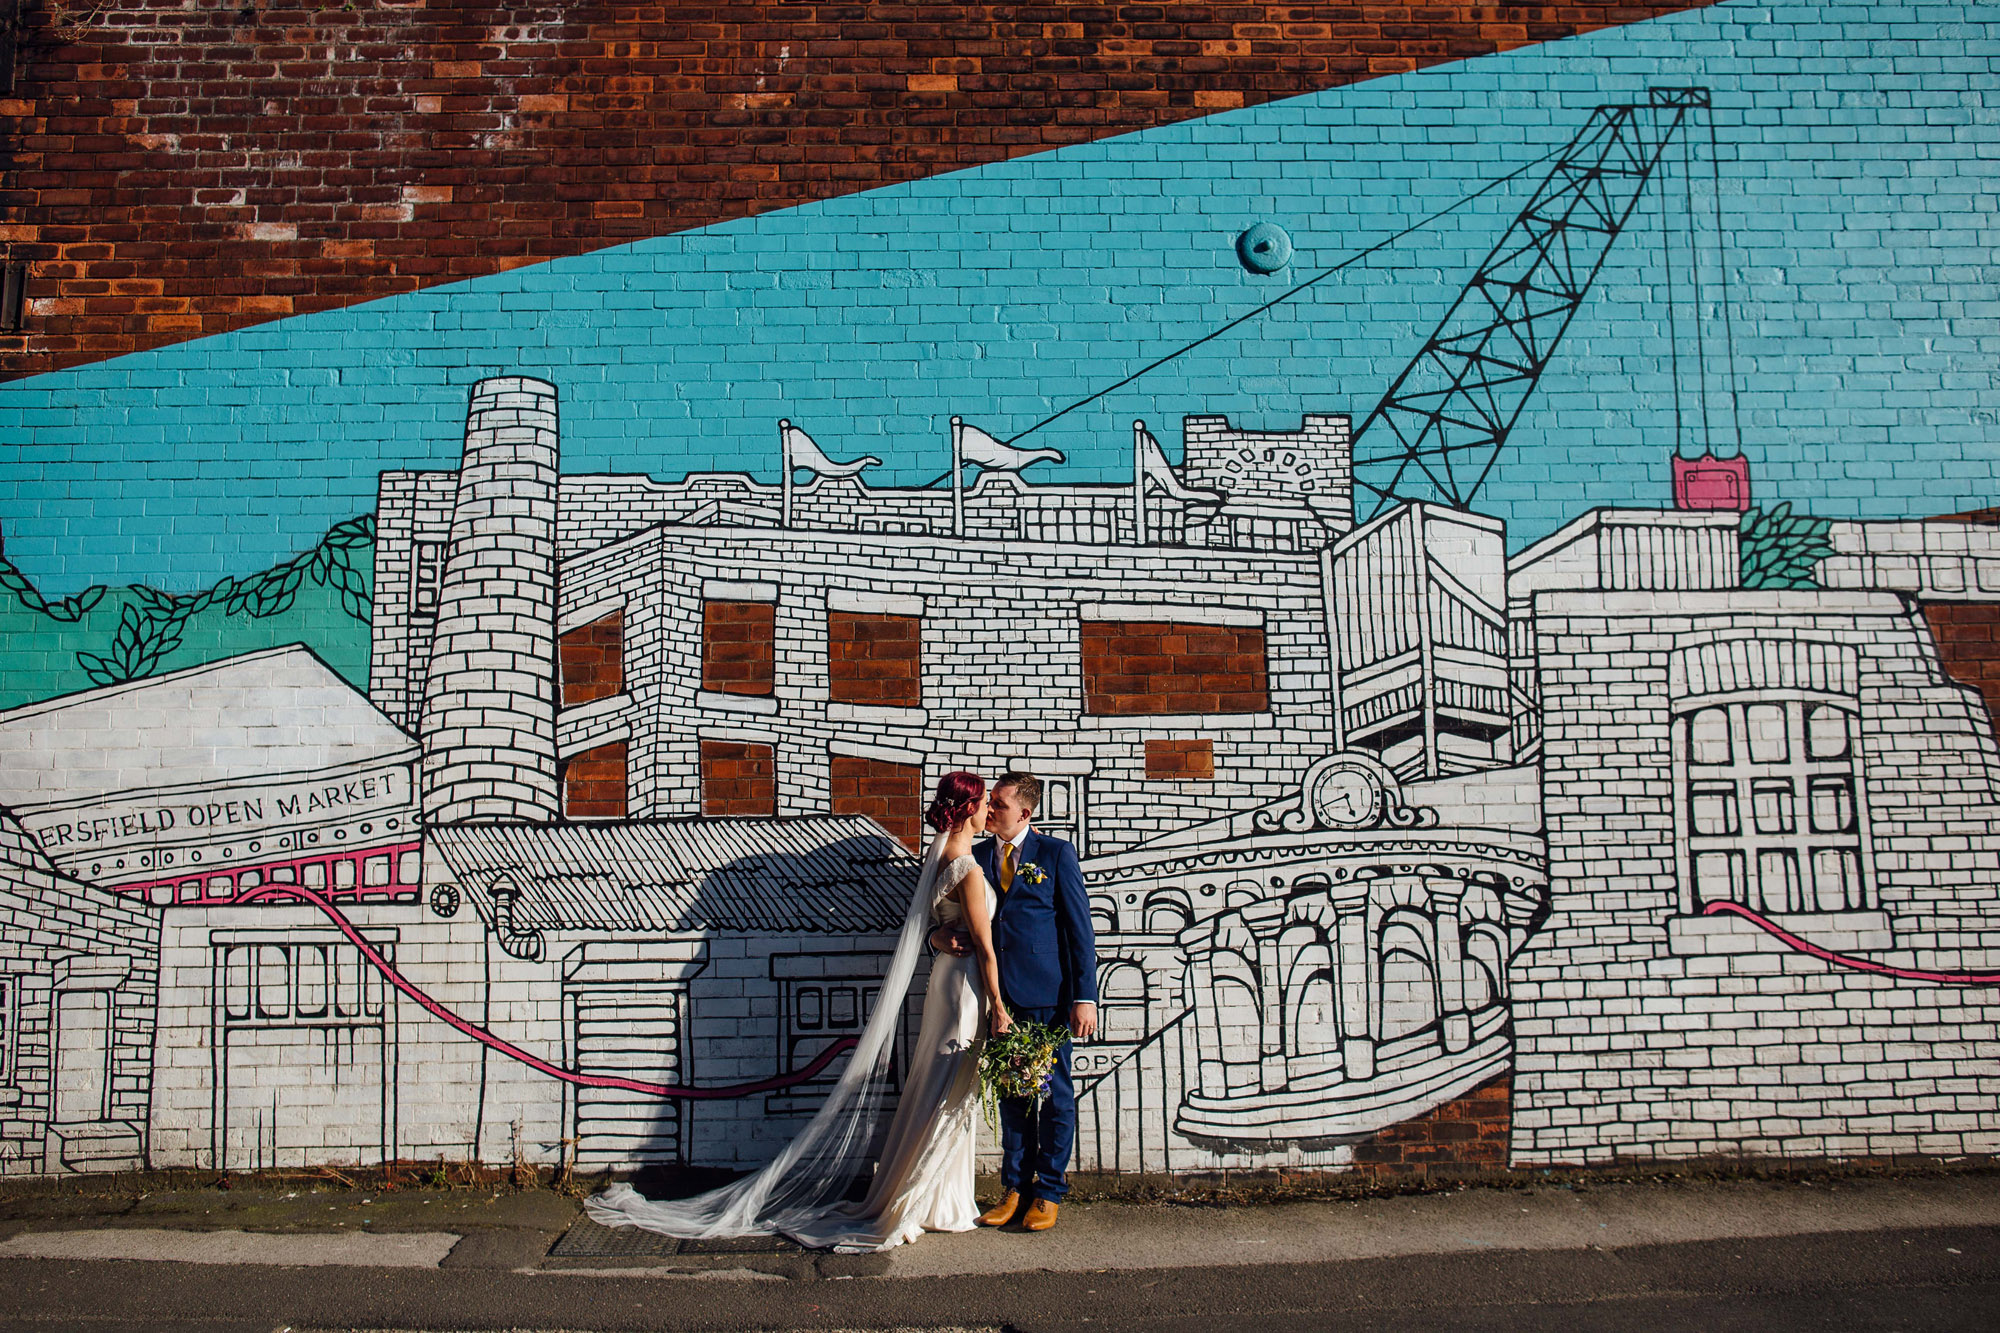 Sarah-Honeysuckle-Bias-Cut-Silk-Vintage-Inspired-Wedding-Gown-Sheffield-Wedding-Kate-Beaumont-52.jpg